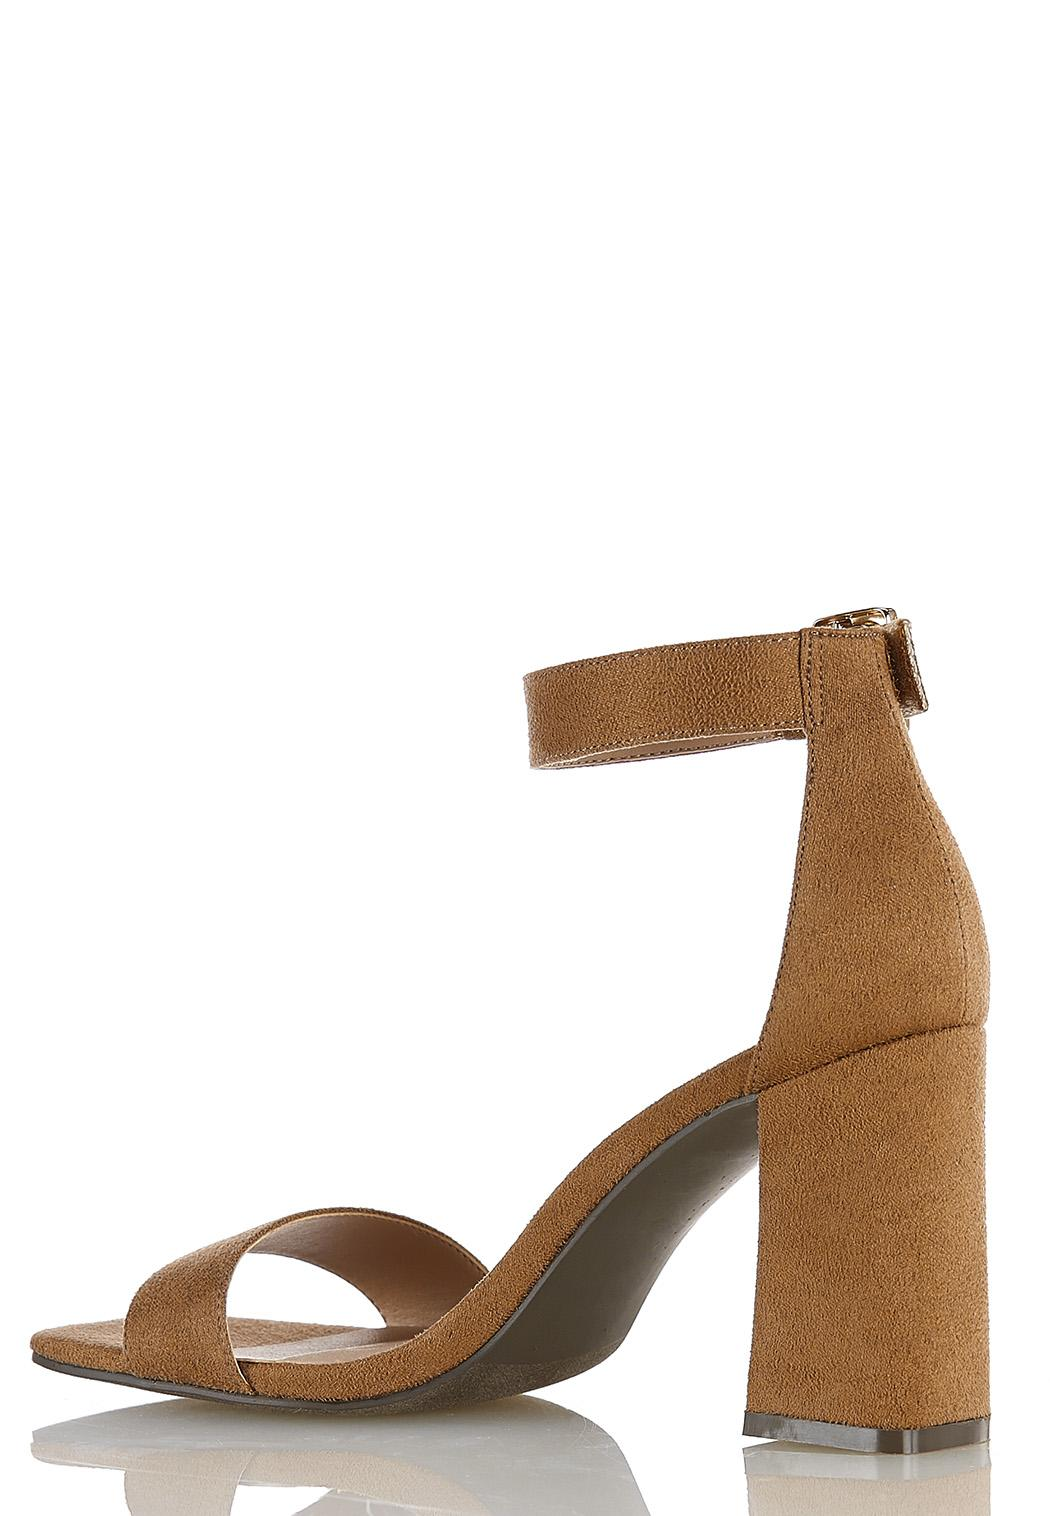 Square Toe Heeled Sandals (Item #44384308)